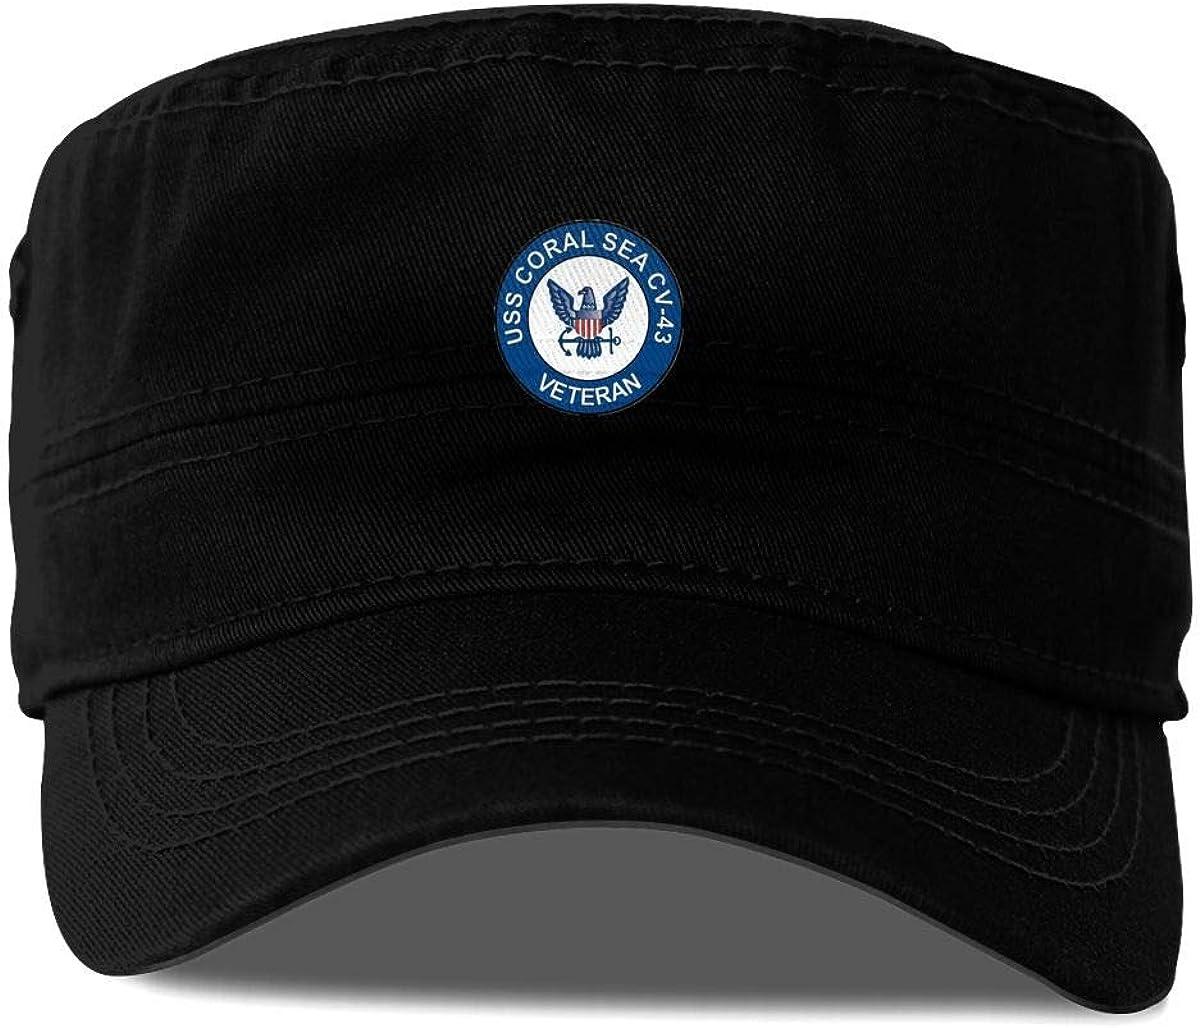 Kibio US Navy USS Coral Sea CV-43 Veteran Military Veteran Served Cap Baseball Hat Adjustable